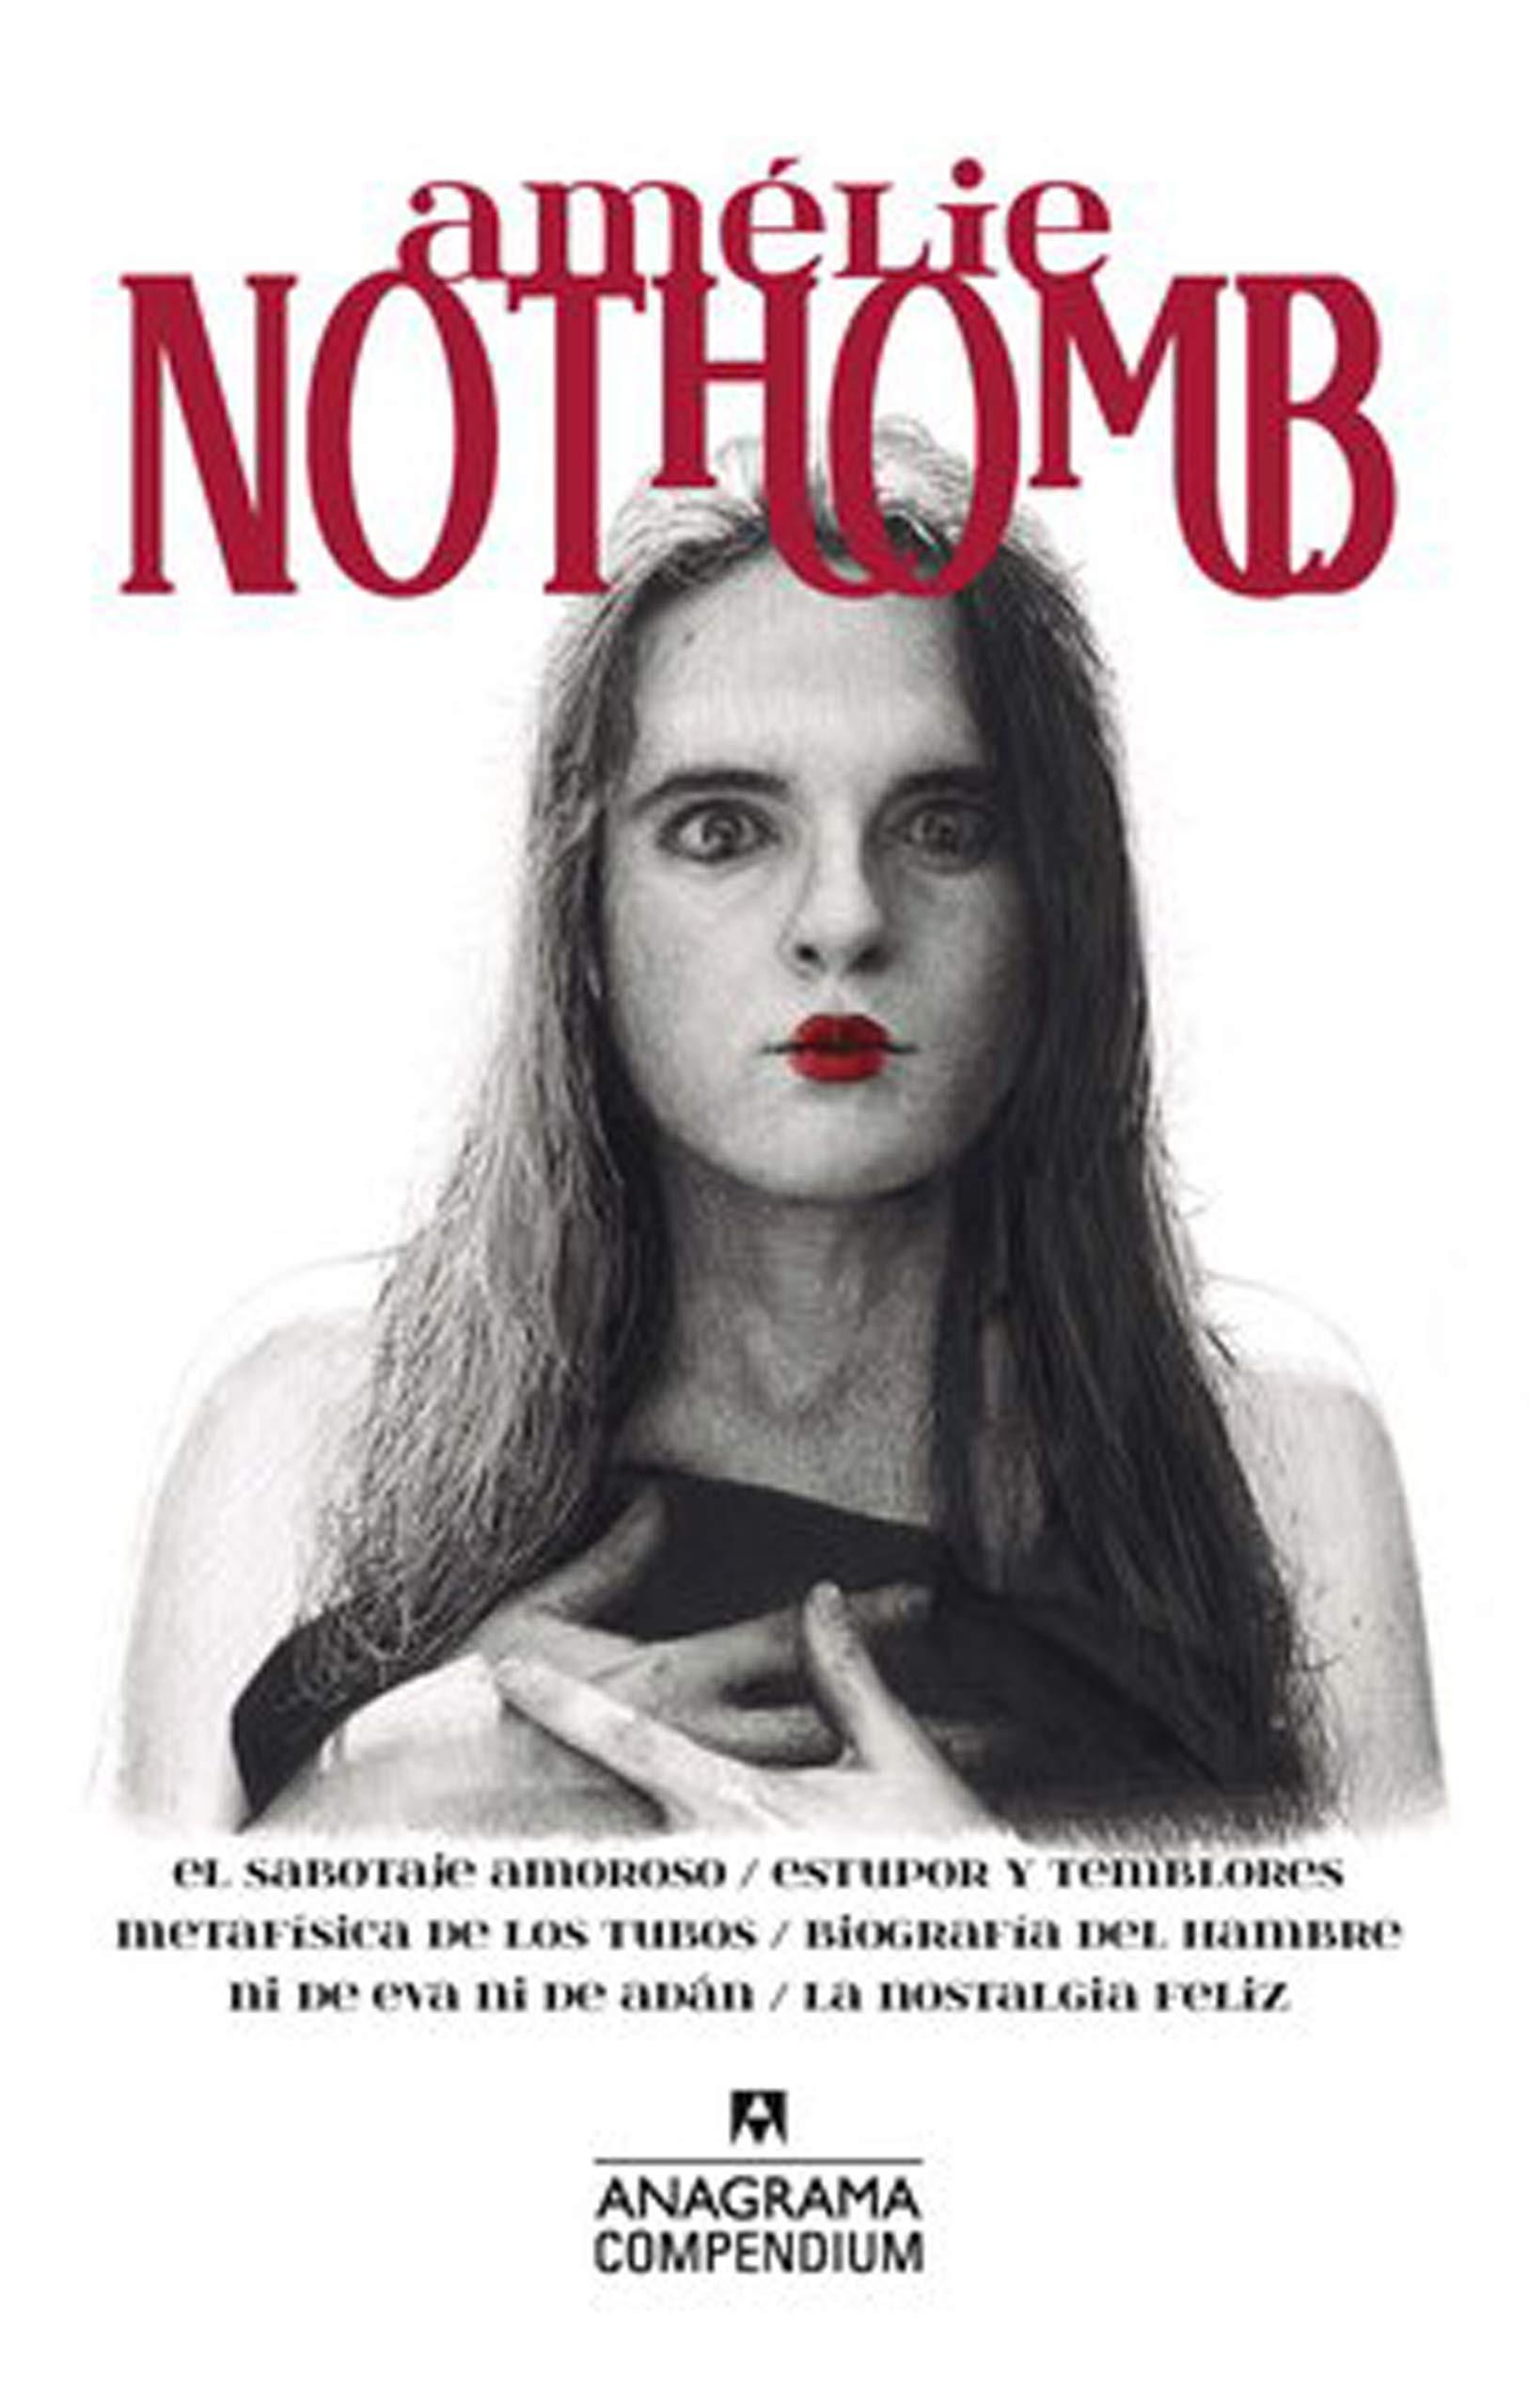 Amelie Nothomb compendium